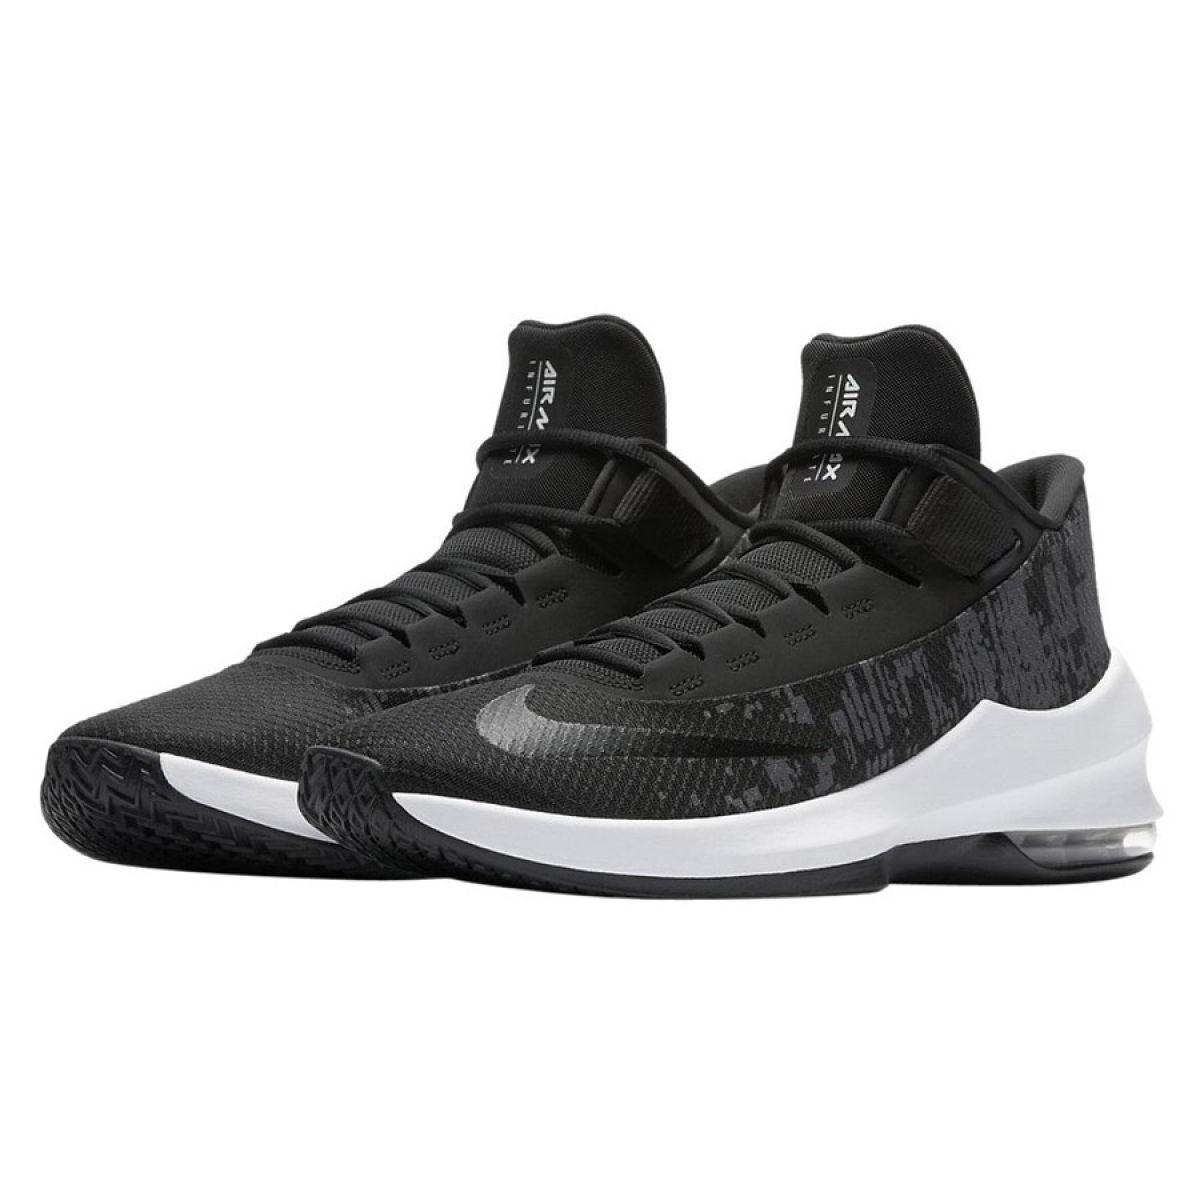 cff628cb72a41 Basketbalové boty Nike Air Max Infuriate 2 Mid M AA7066-001 obrázek 2